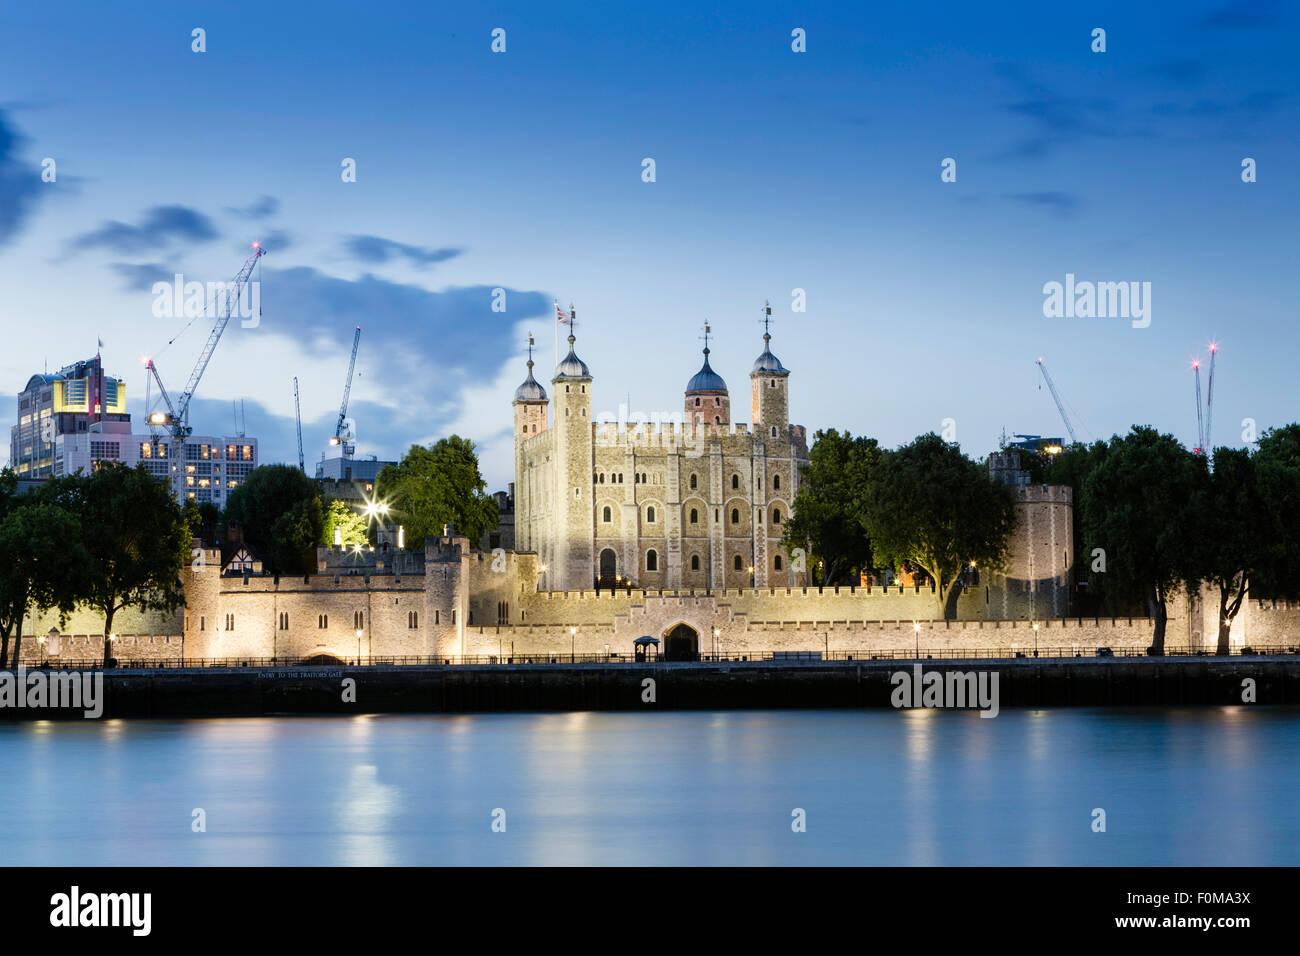 La Torre de Londres, Londres, Inglaterra Foto de stock